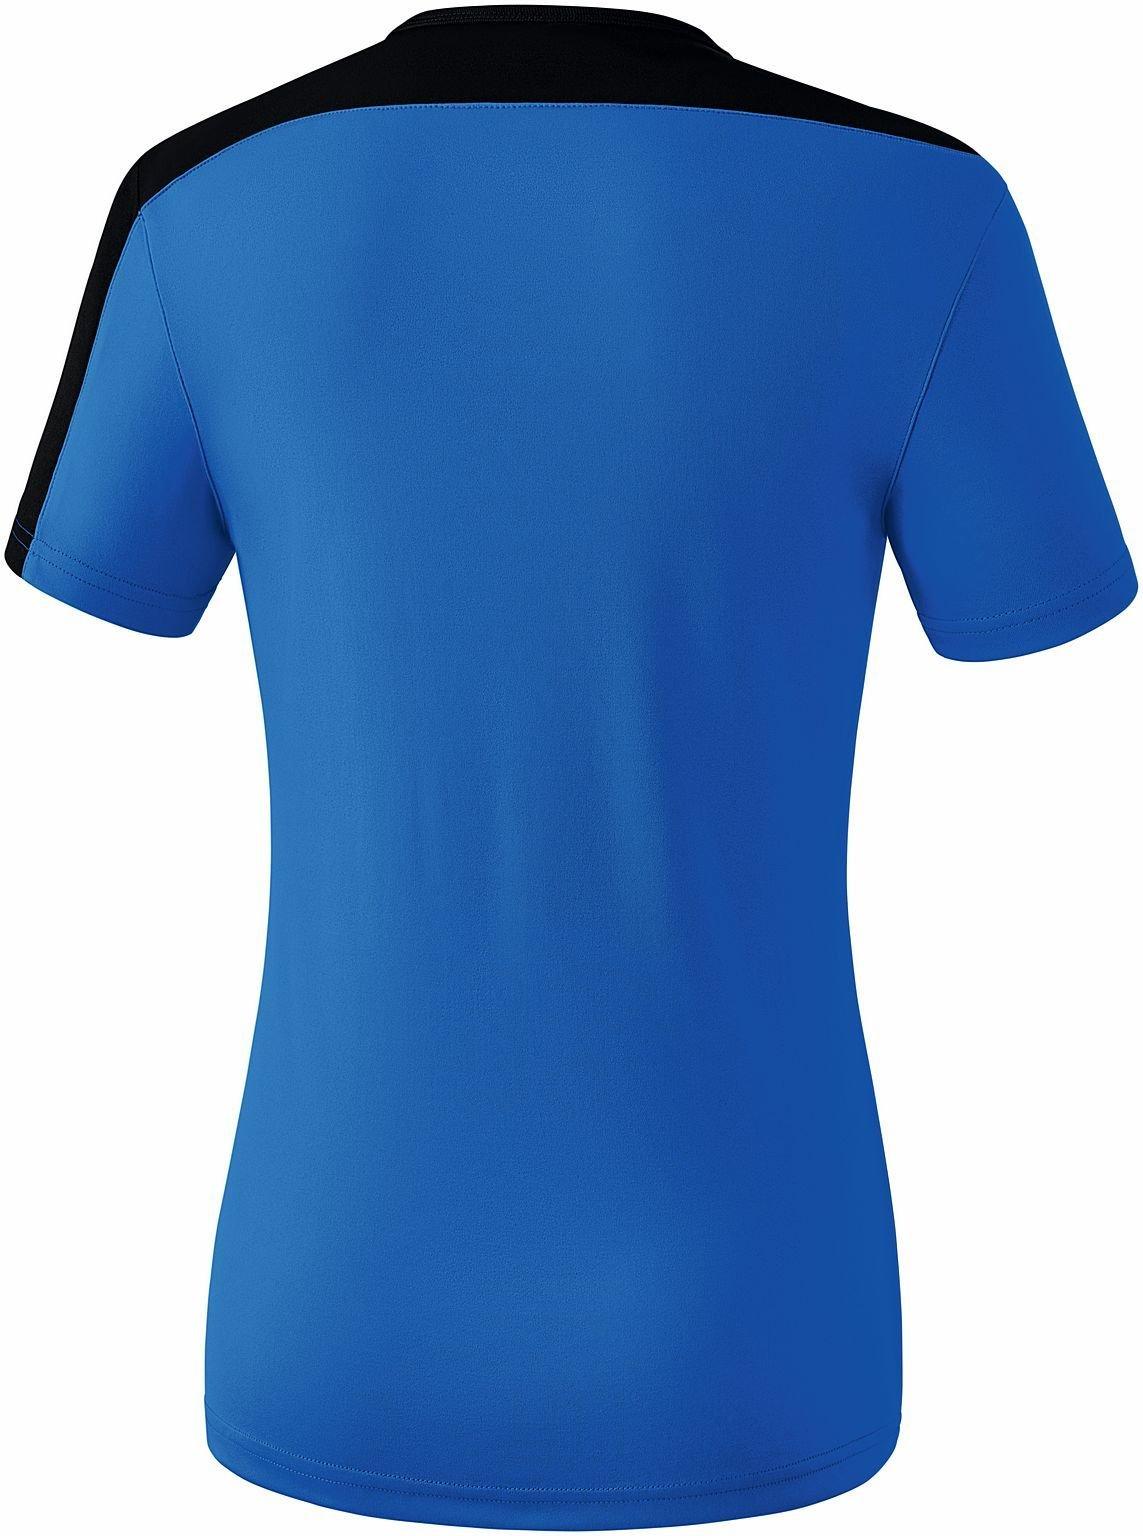 Club 1900 2.0 T-Shirt Damen